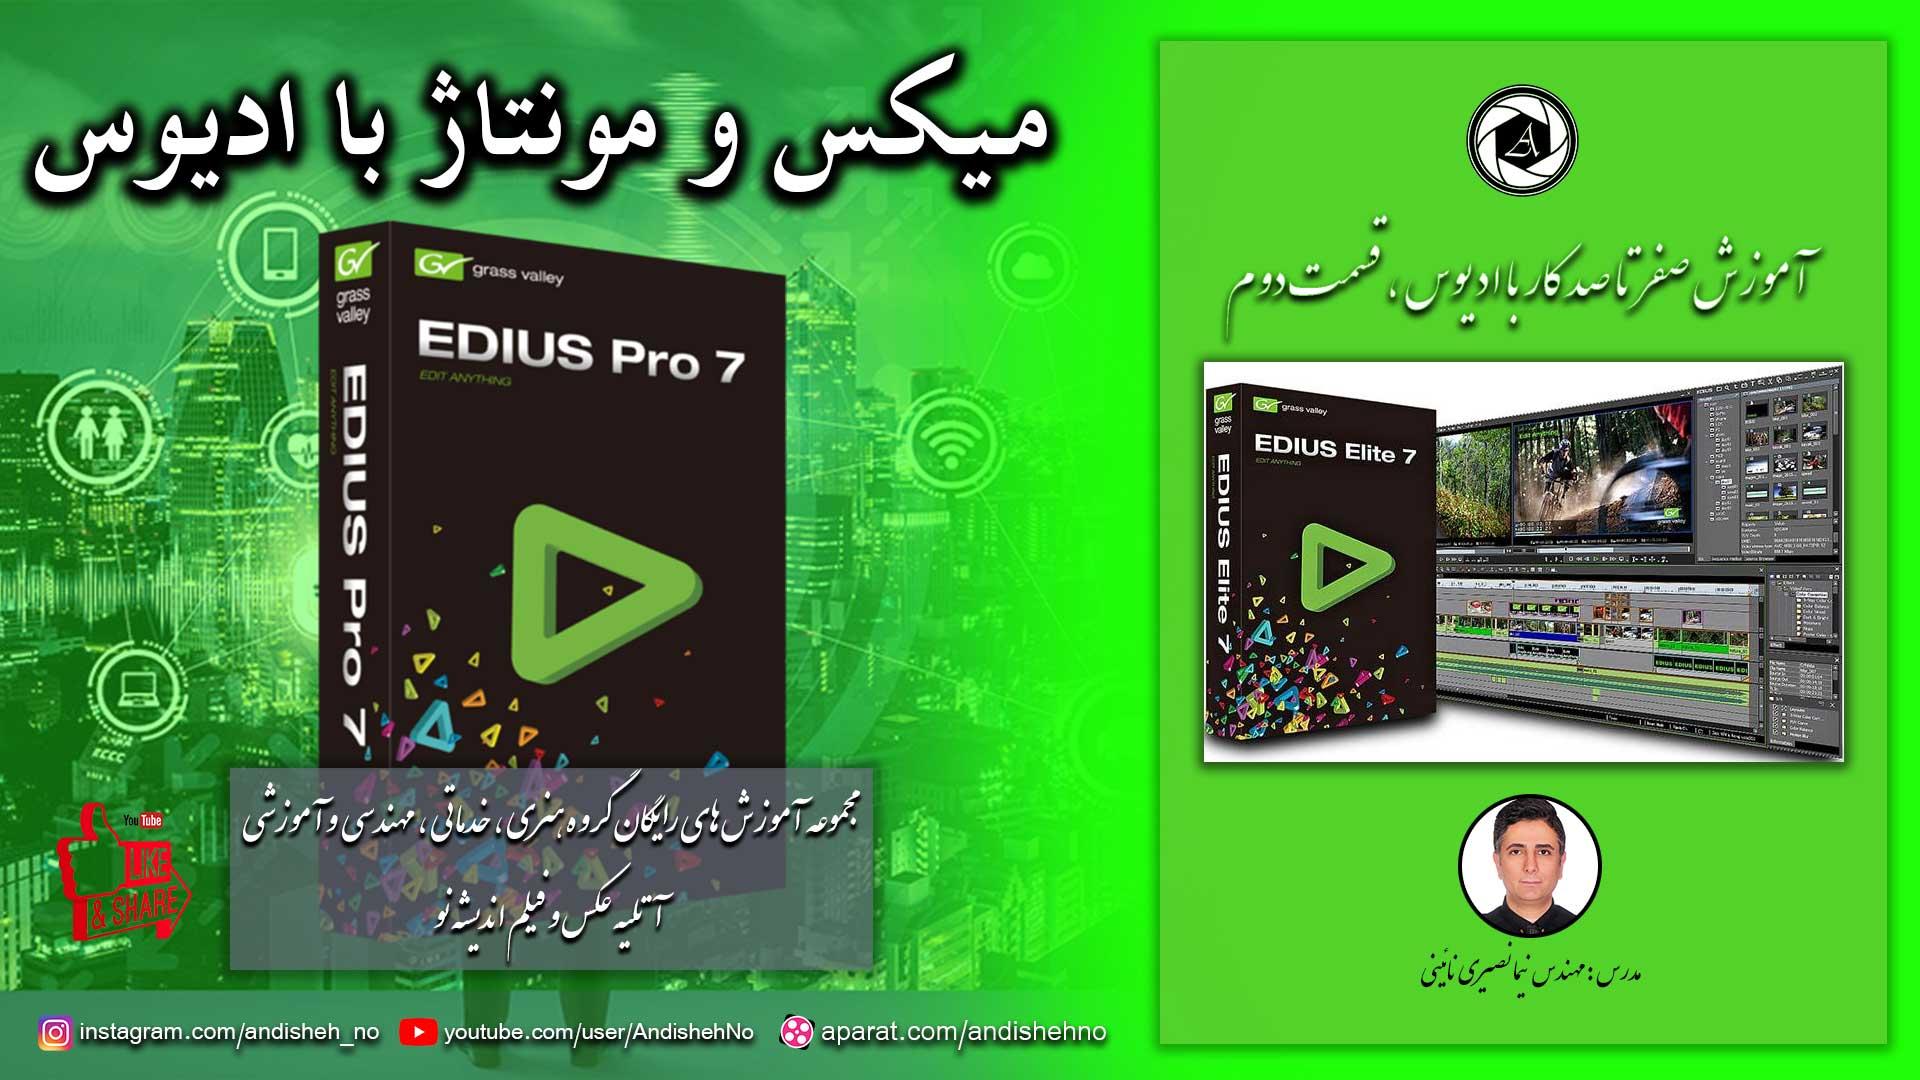 logo andisheh no cover Education edius mix